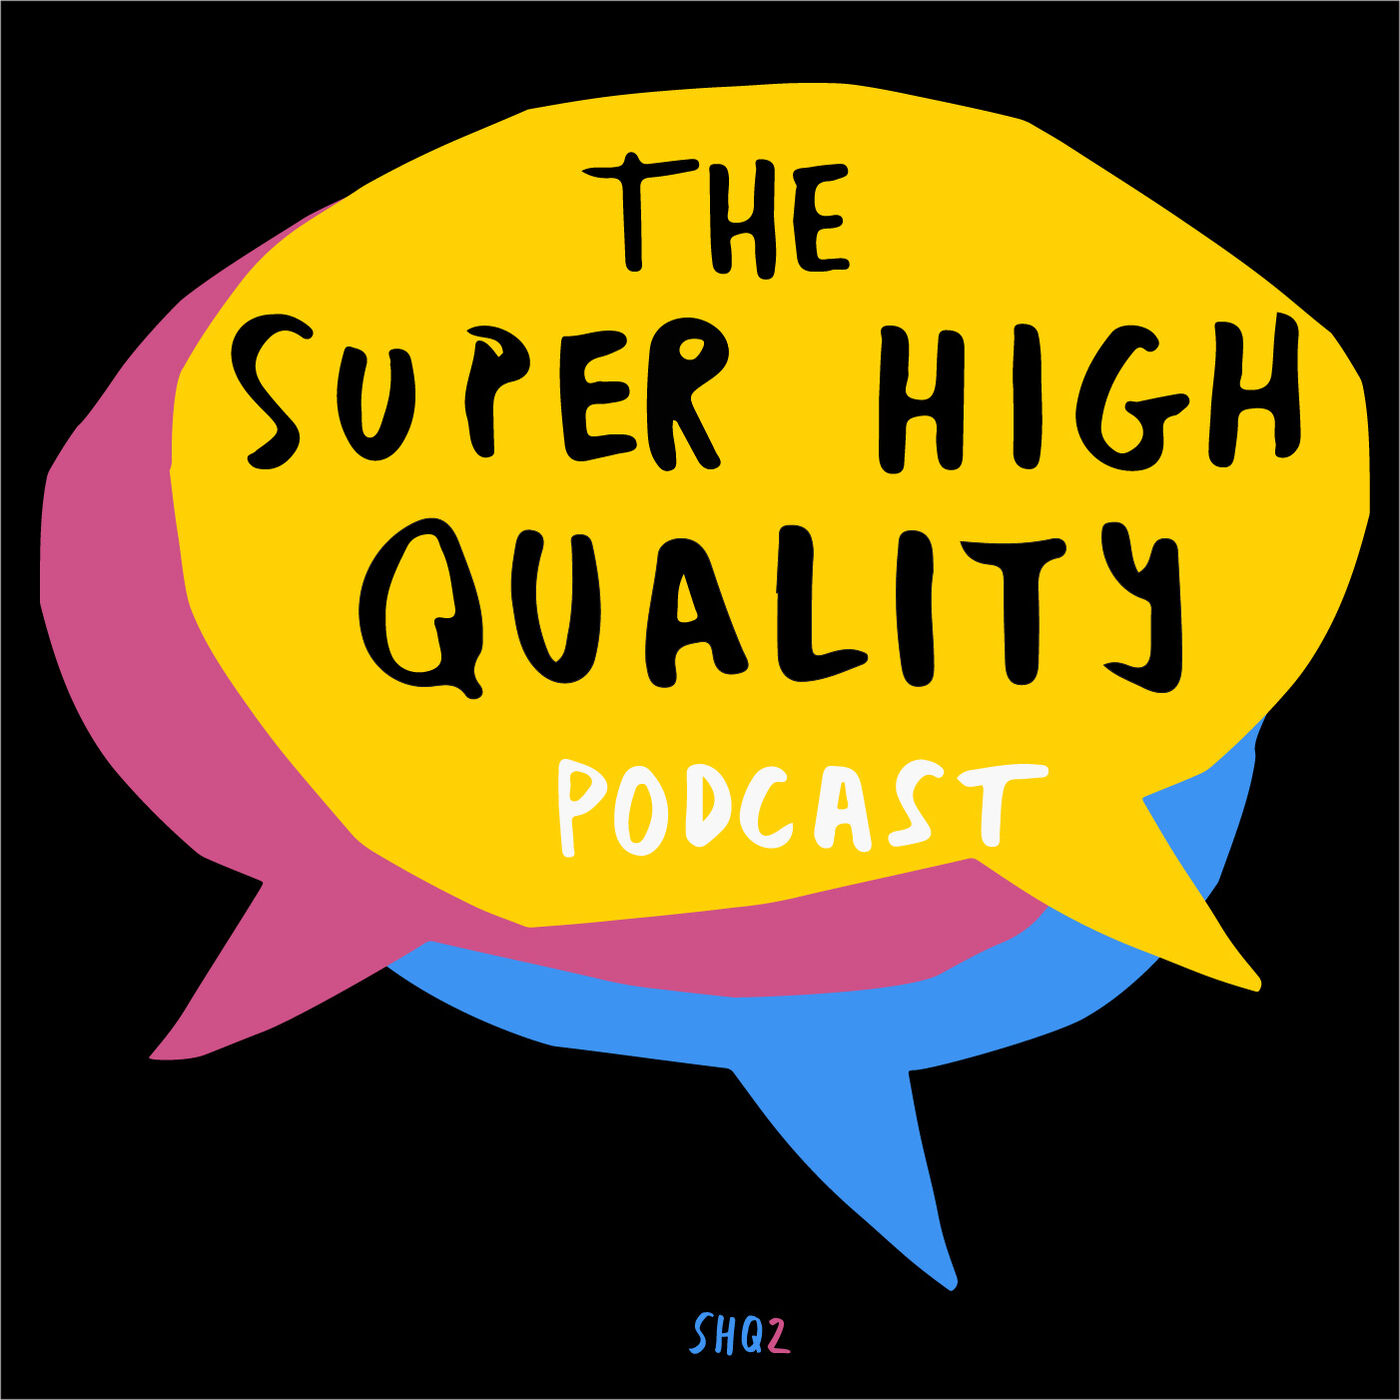 The Super High Quality Podcast Trailer